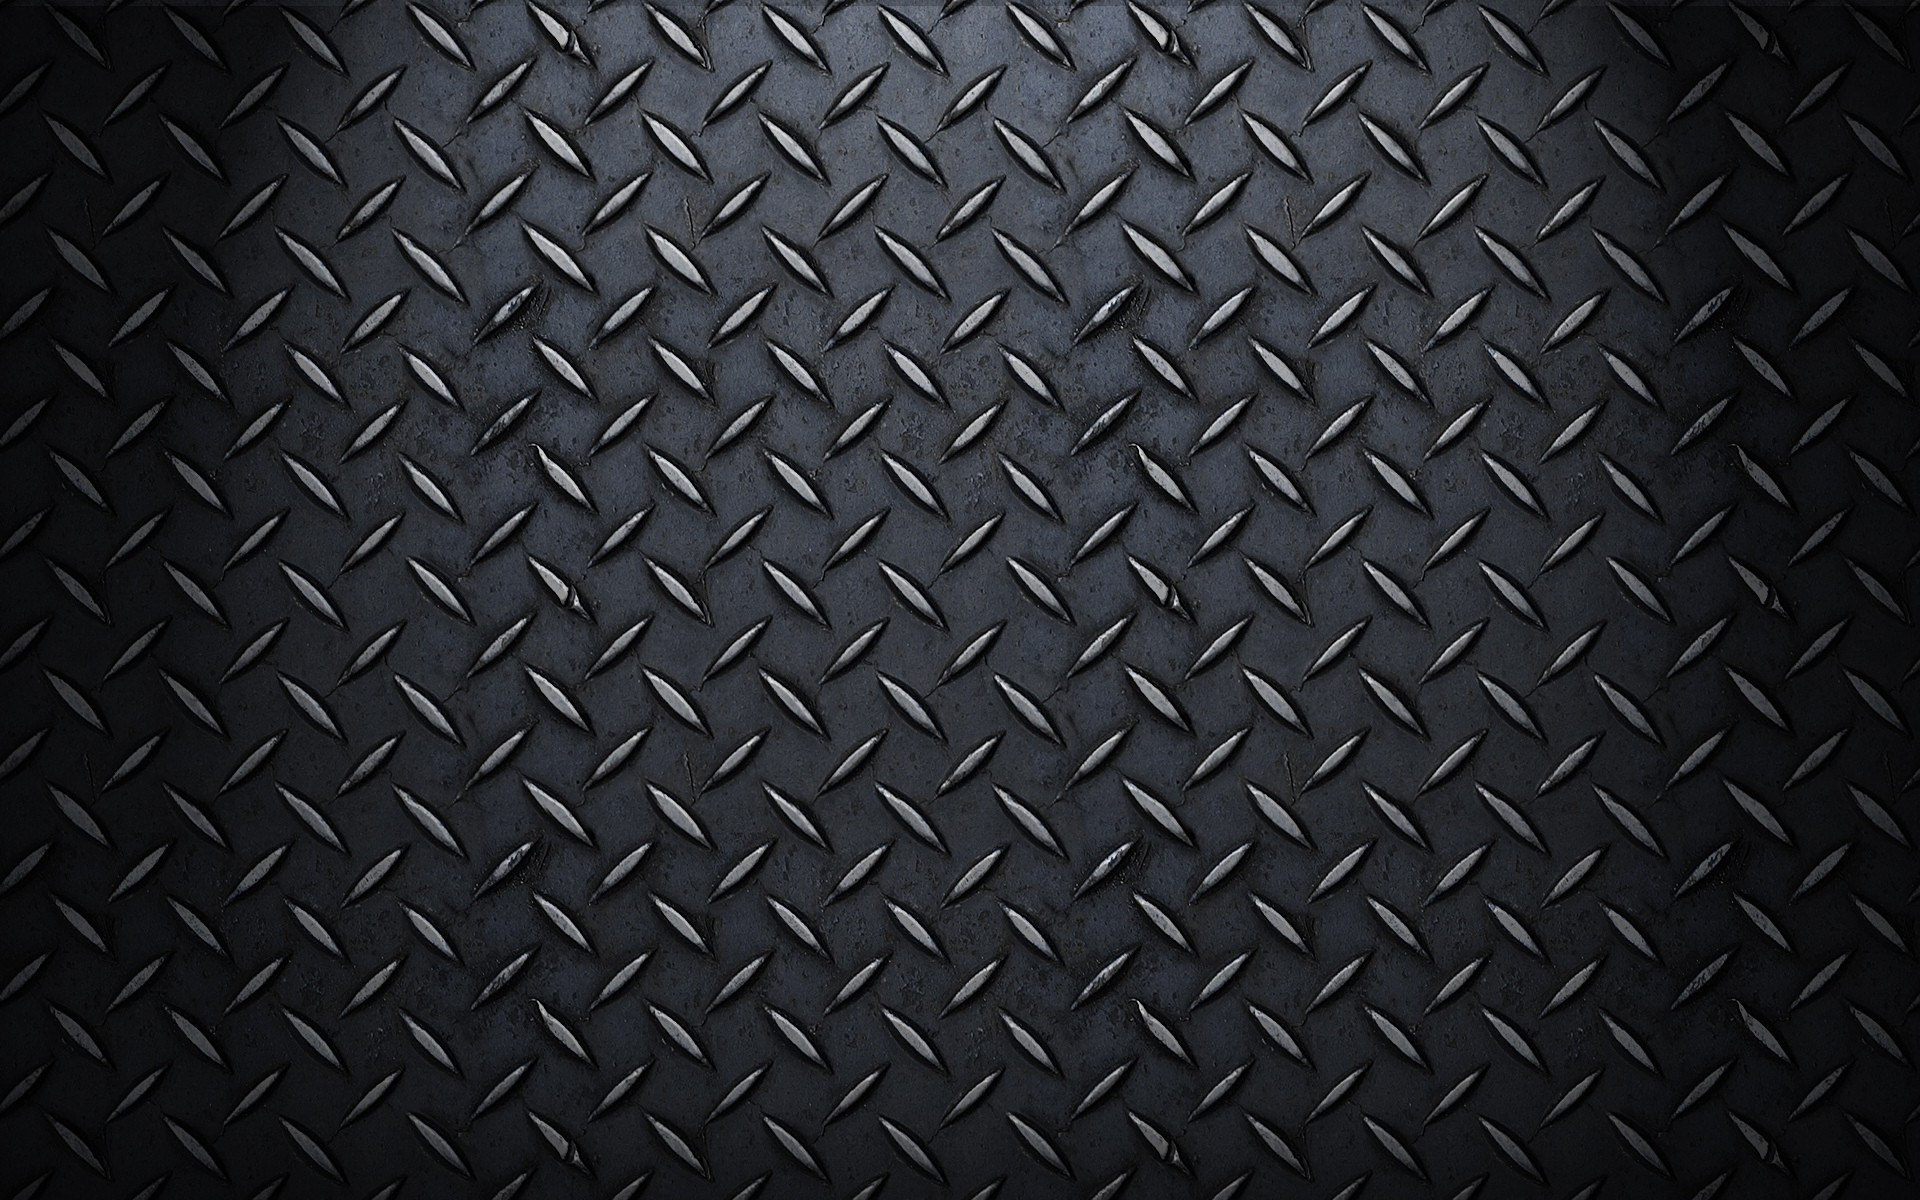 Carbon Fiber Pattern Photoshop wallpaper 106855 1920x1200